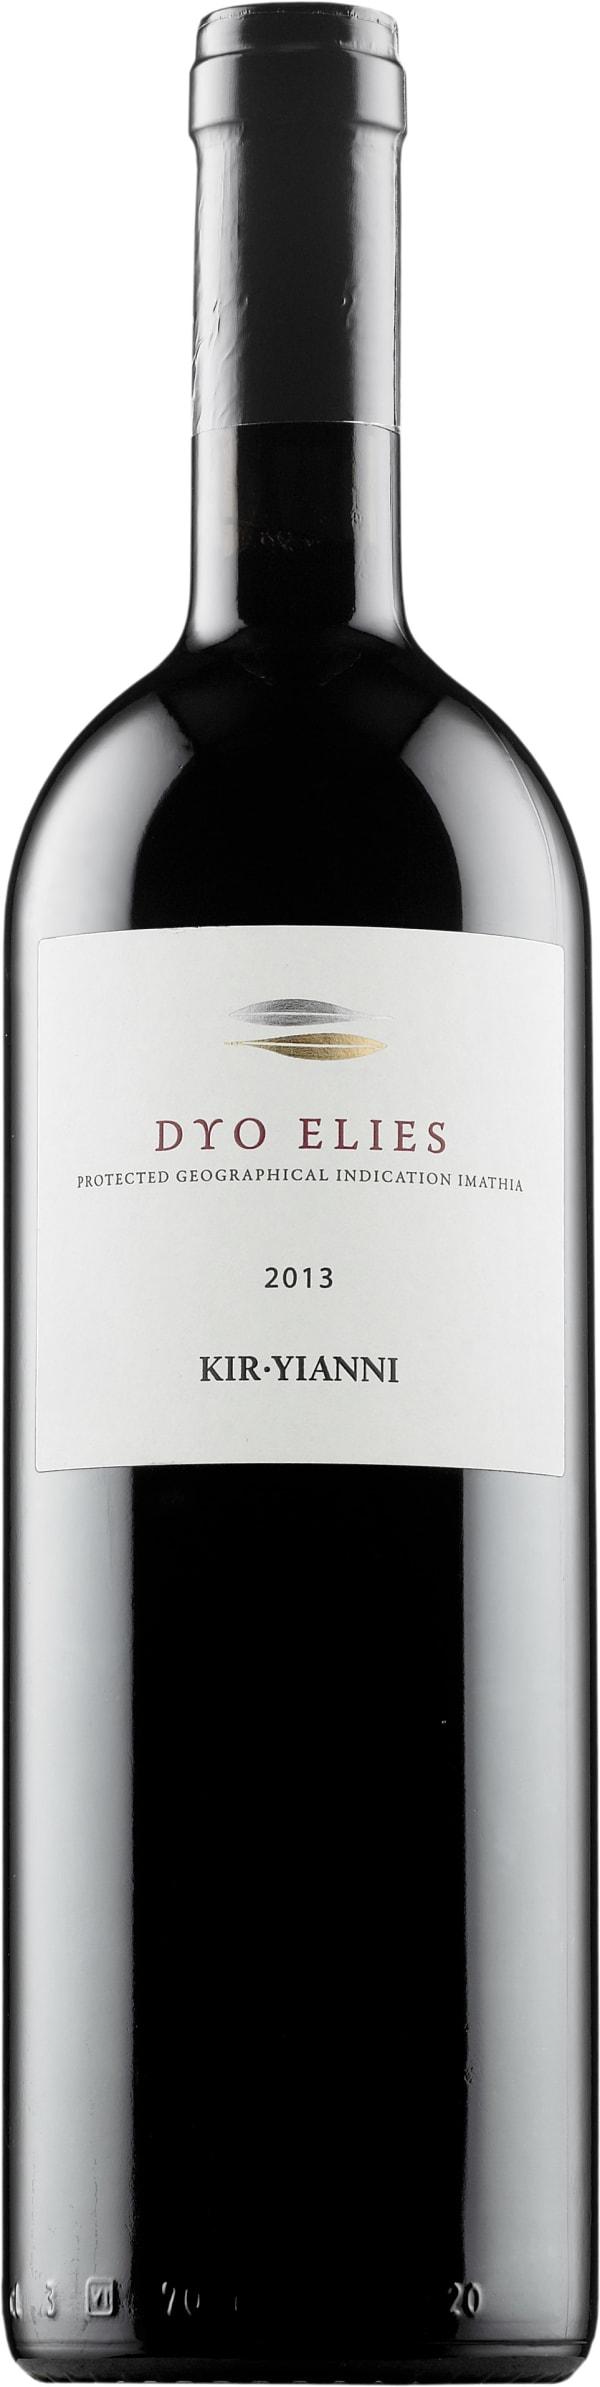 Kir-Yianni Dyo Elies 2013